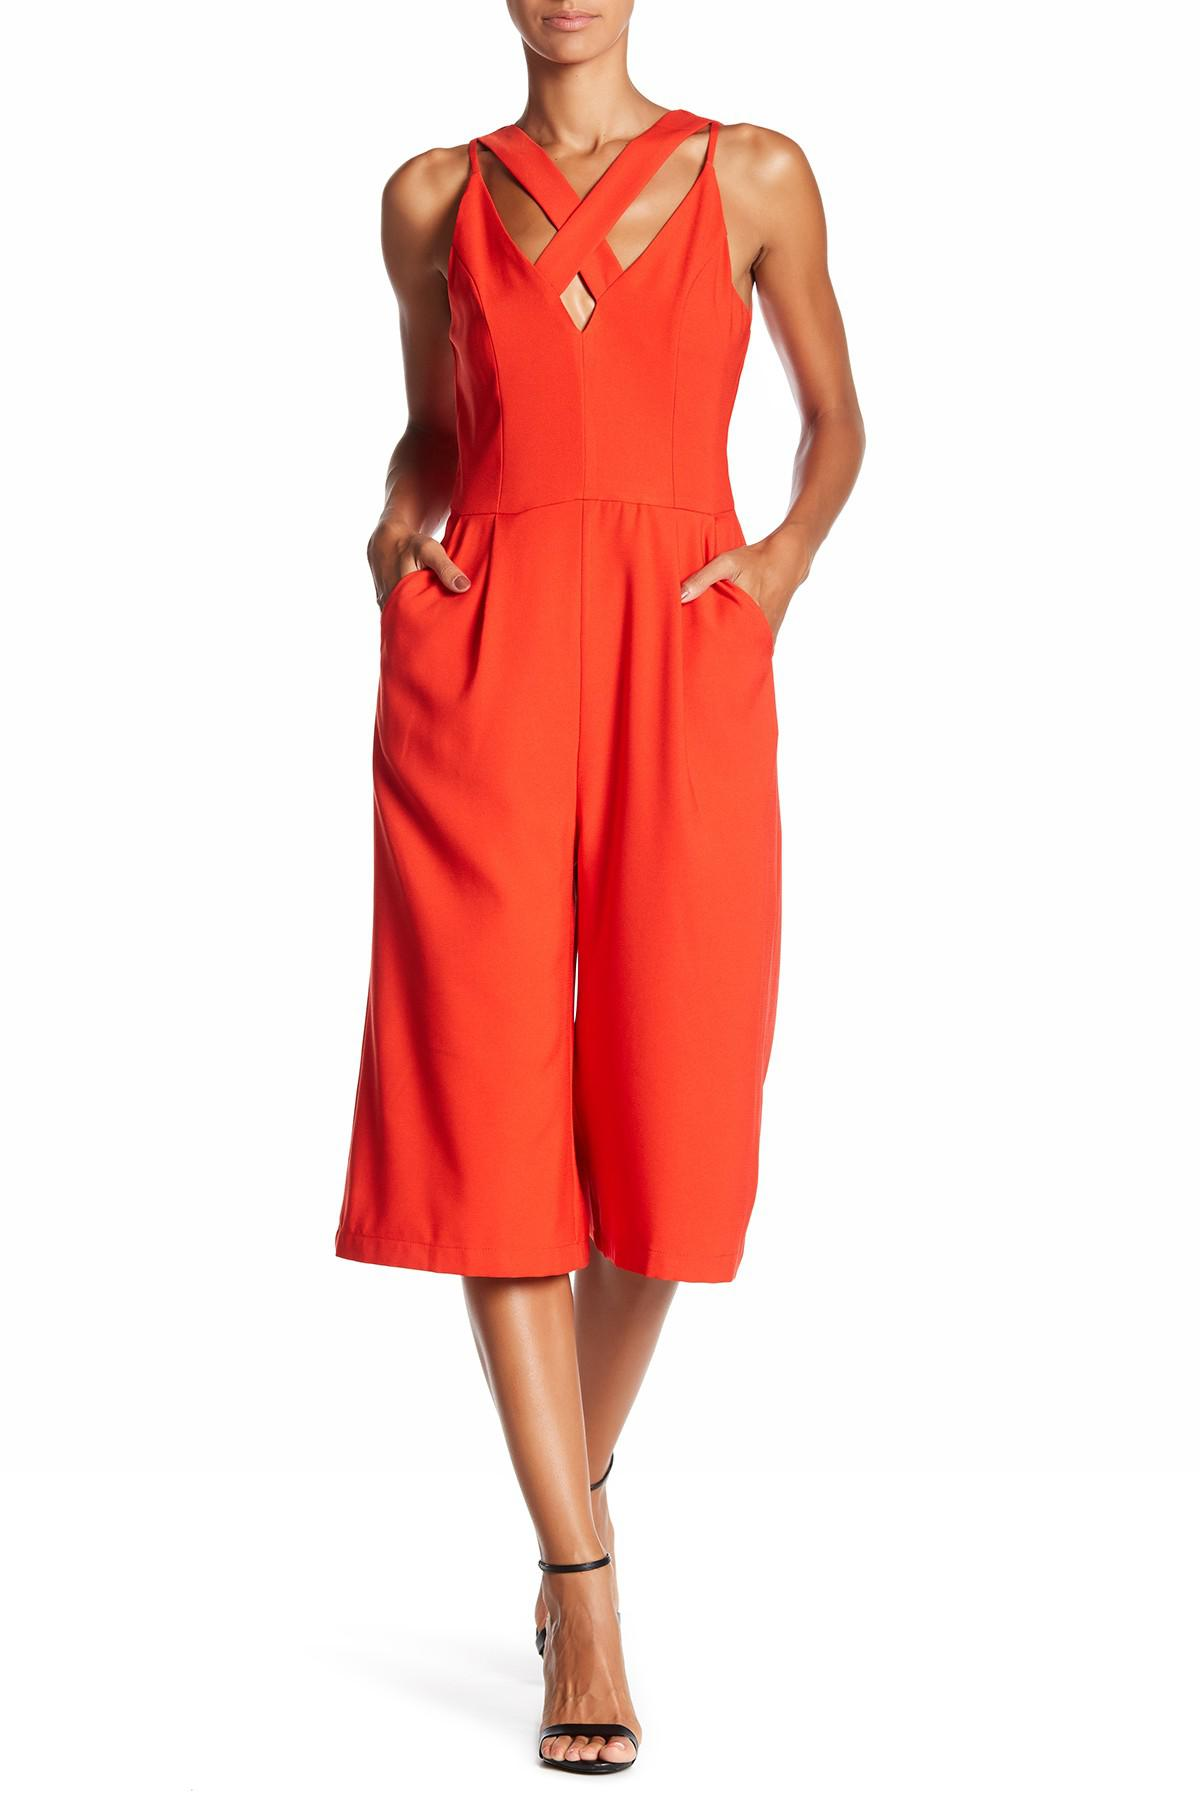 986a31ea94d6 Lyst - Adelyn Rae Crisscross Culotte Jumpsuit in Red